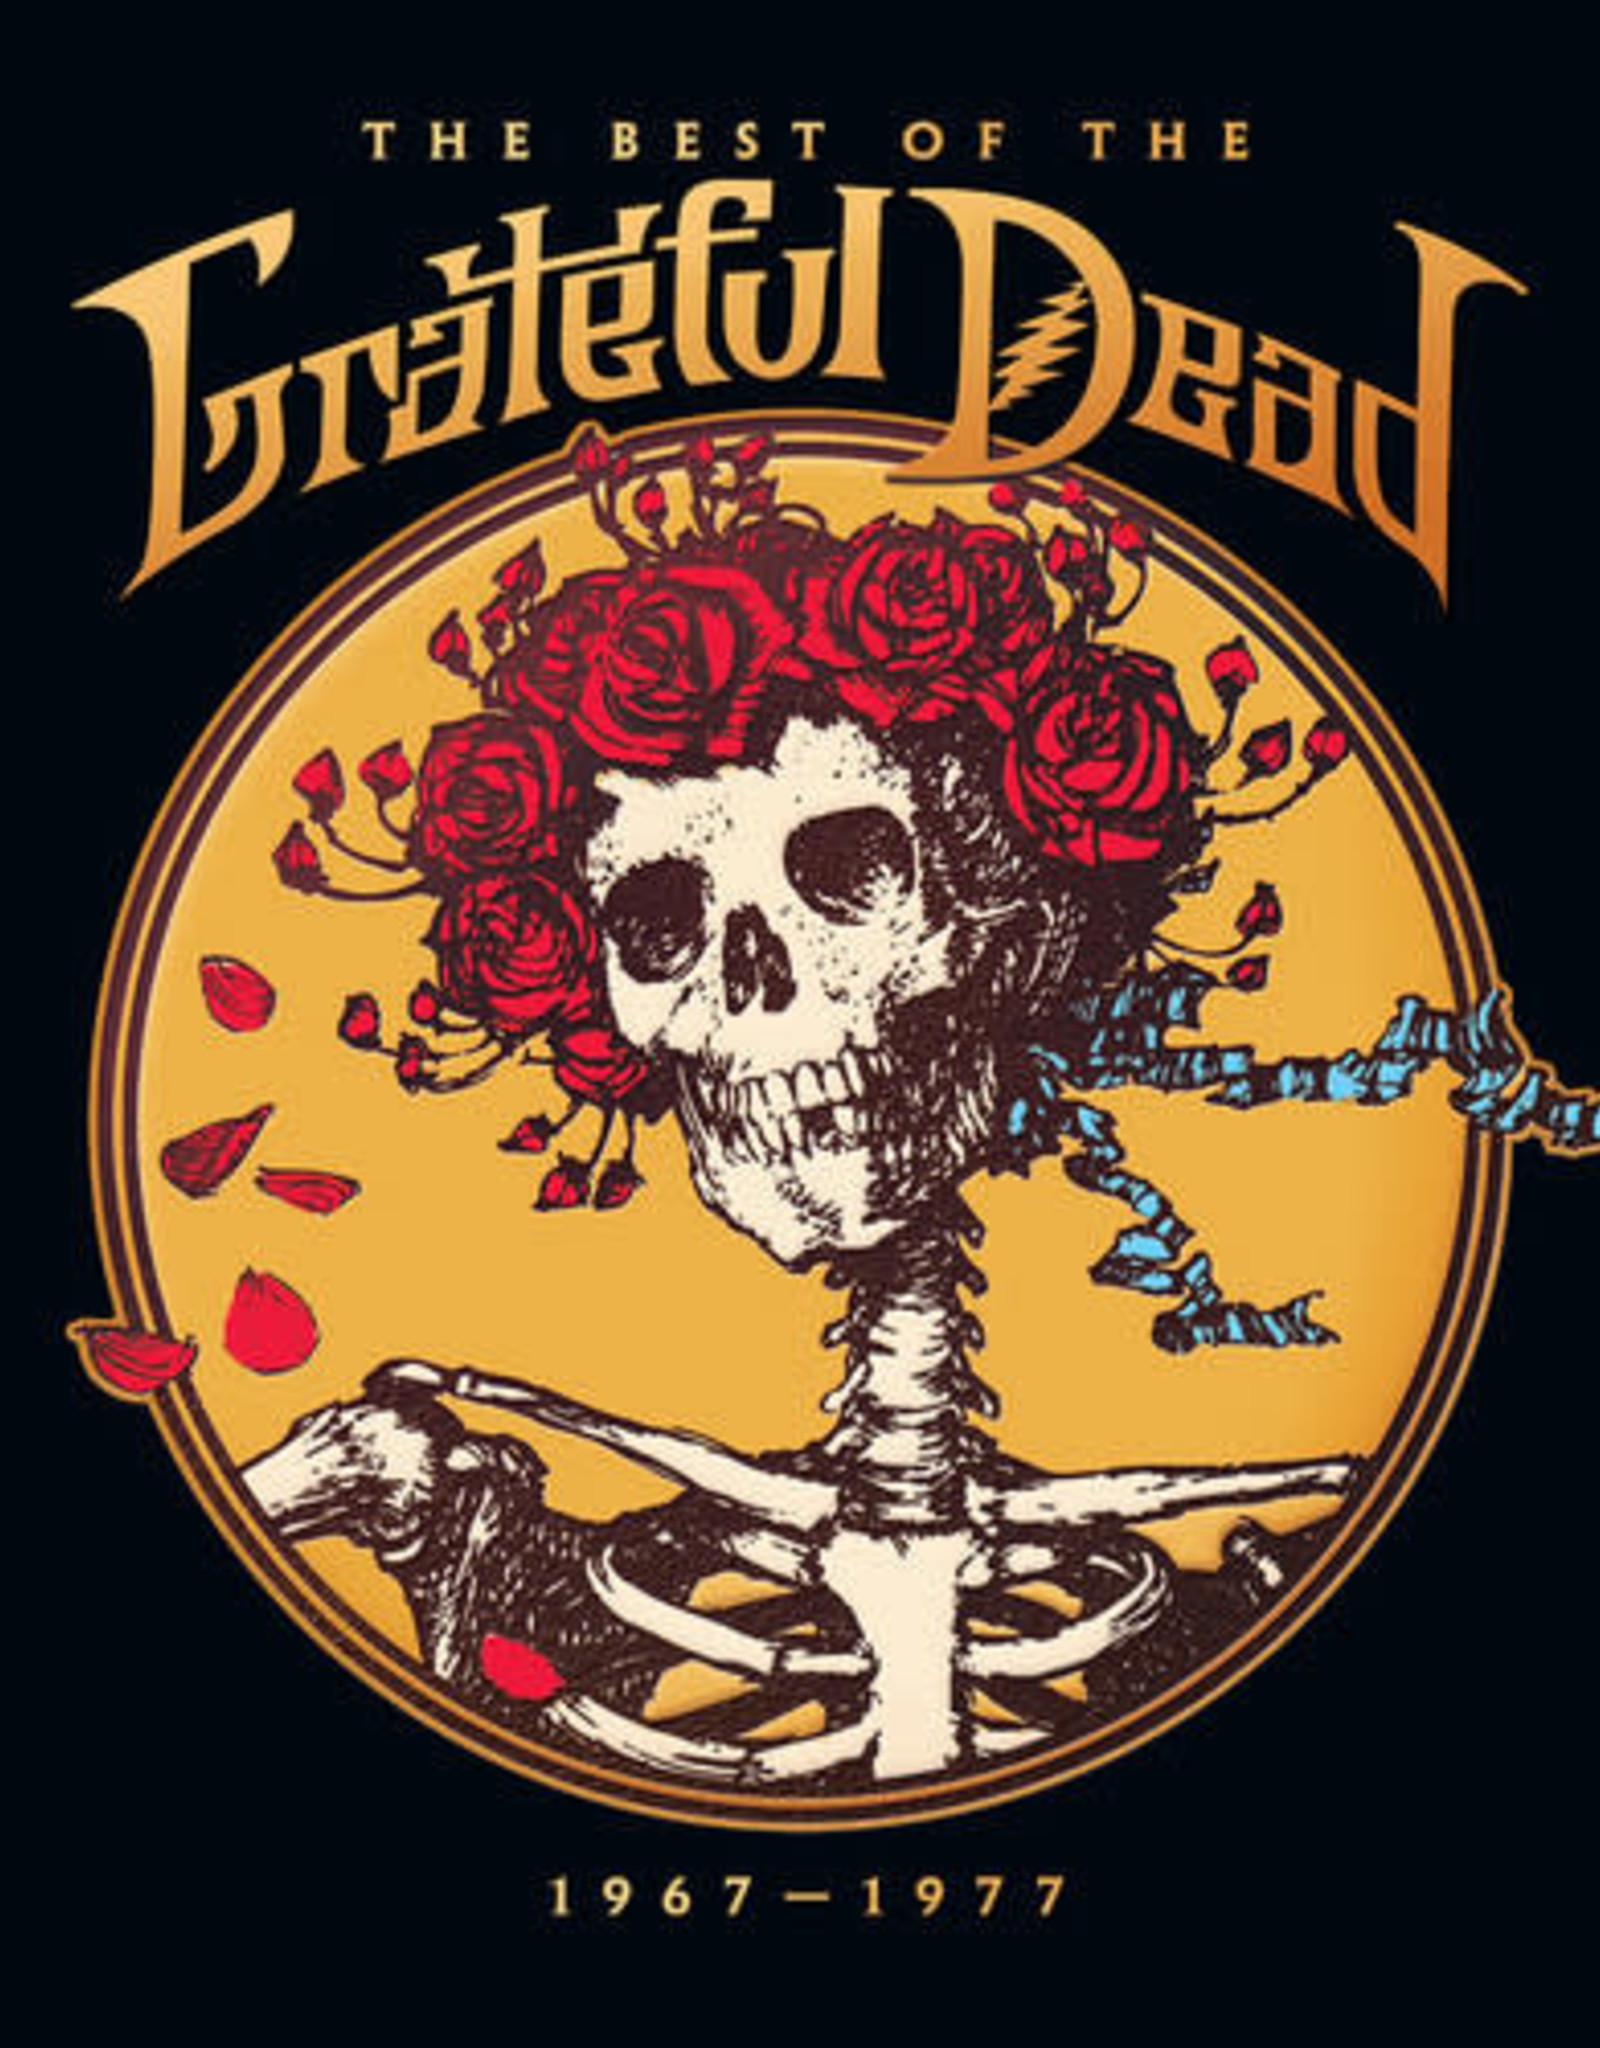 Grateful Dead - Best of the Grateful Dead 1967-1977